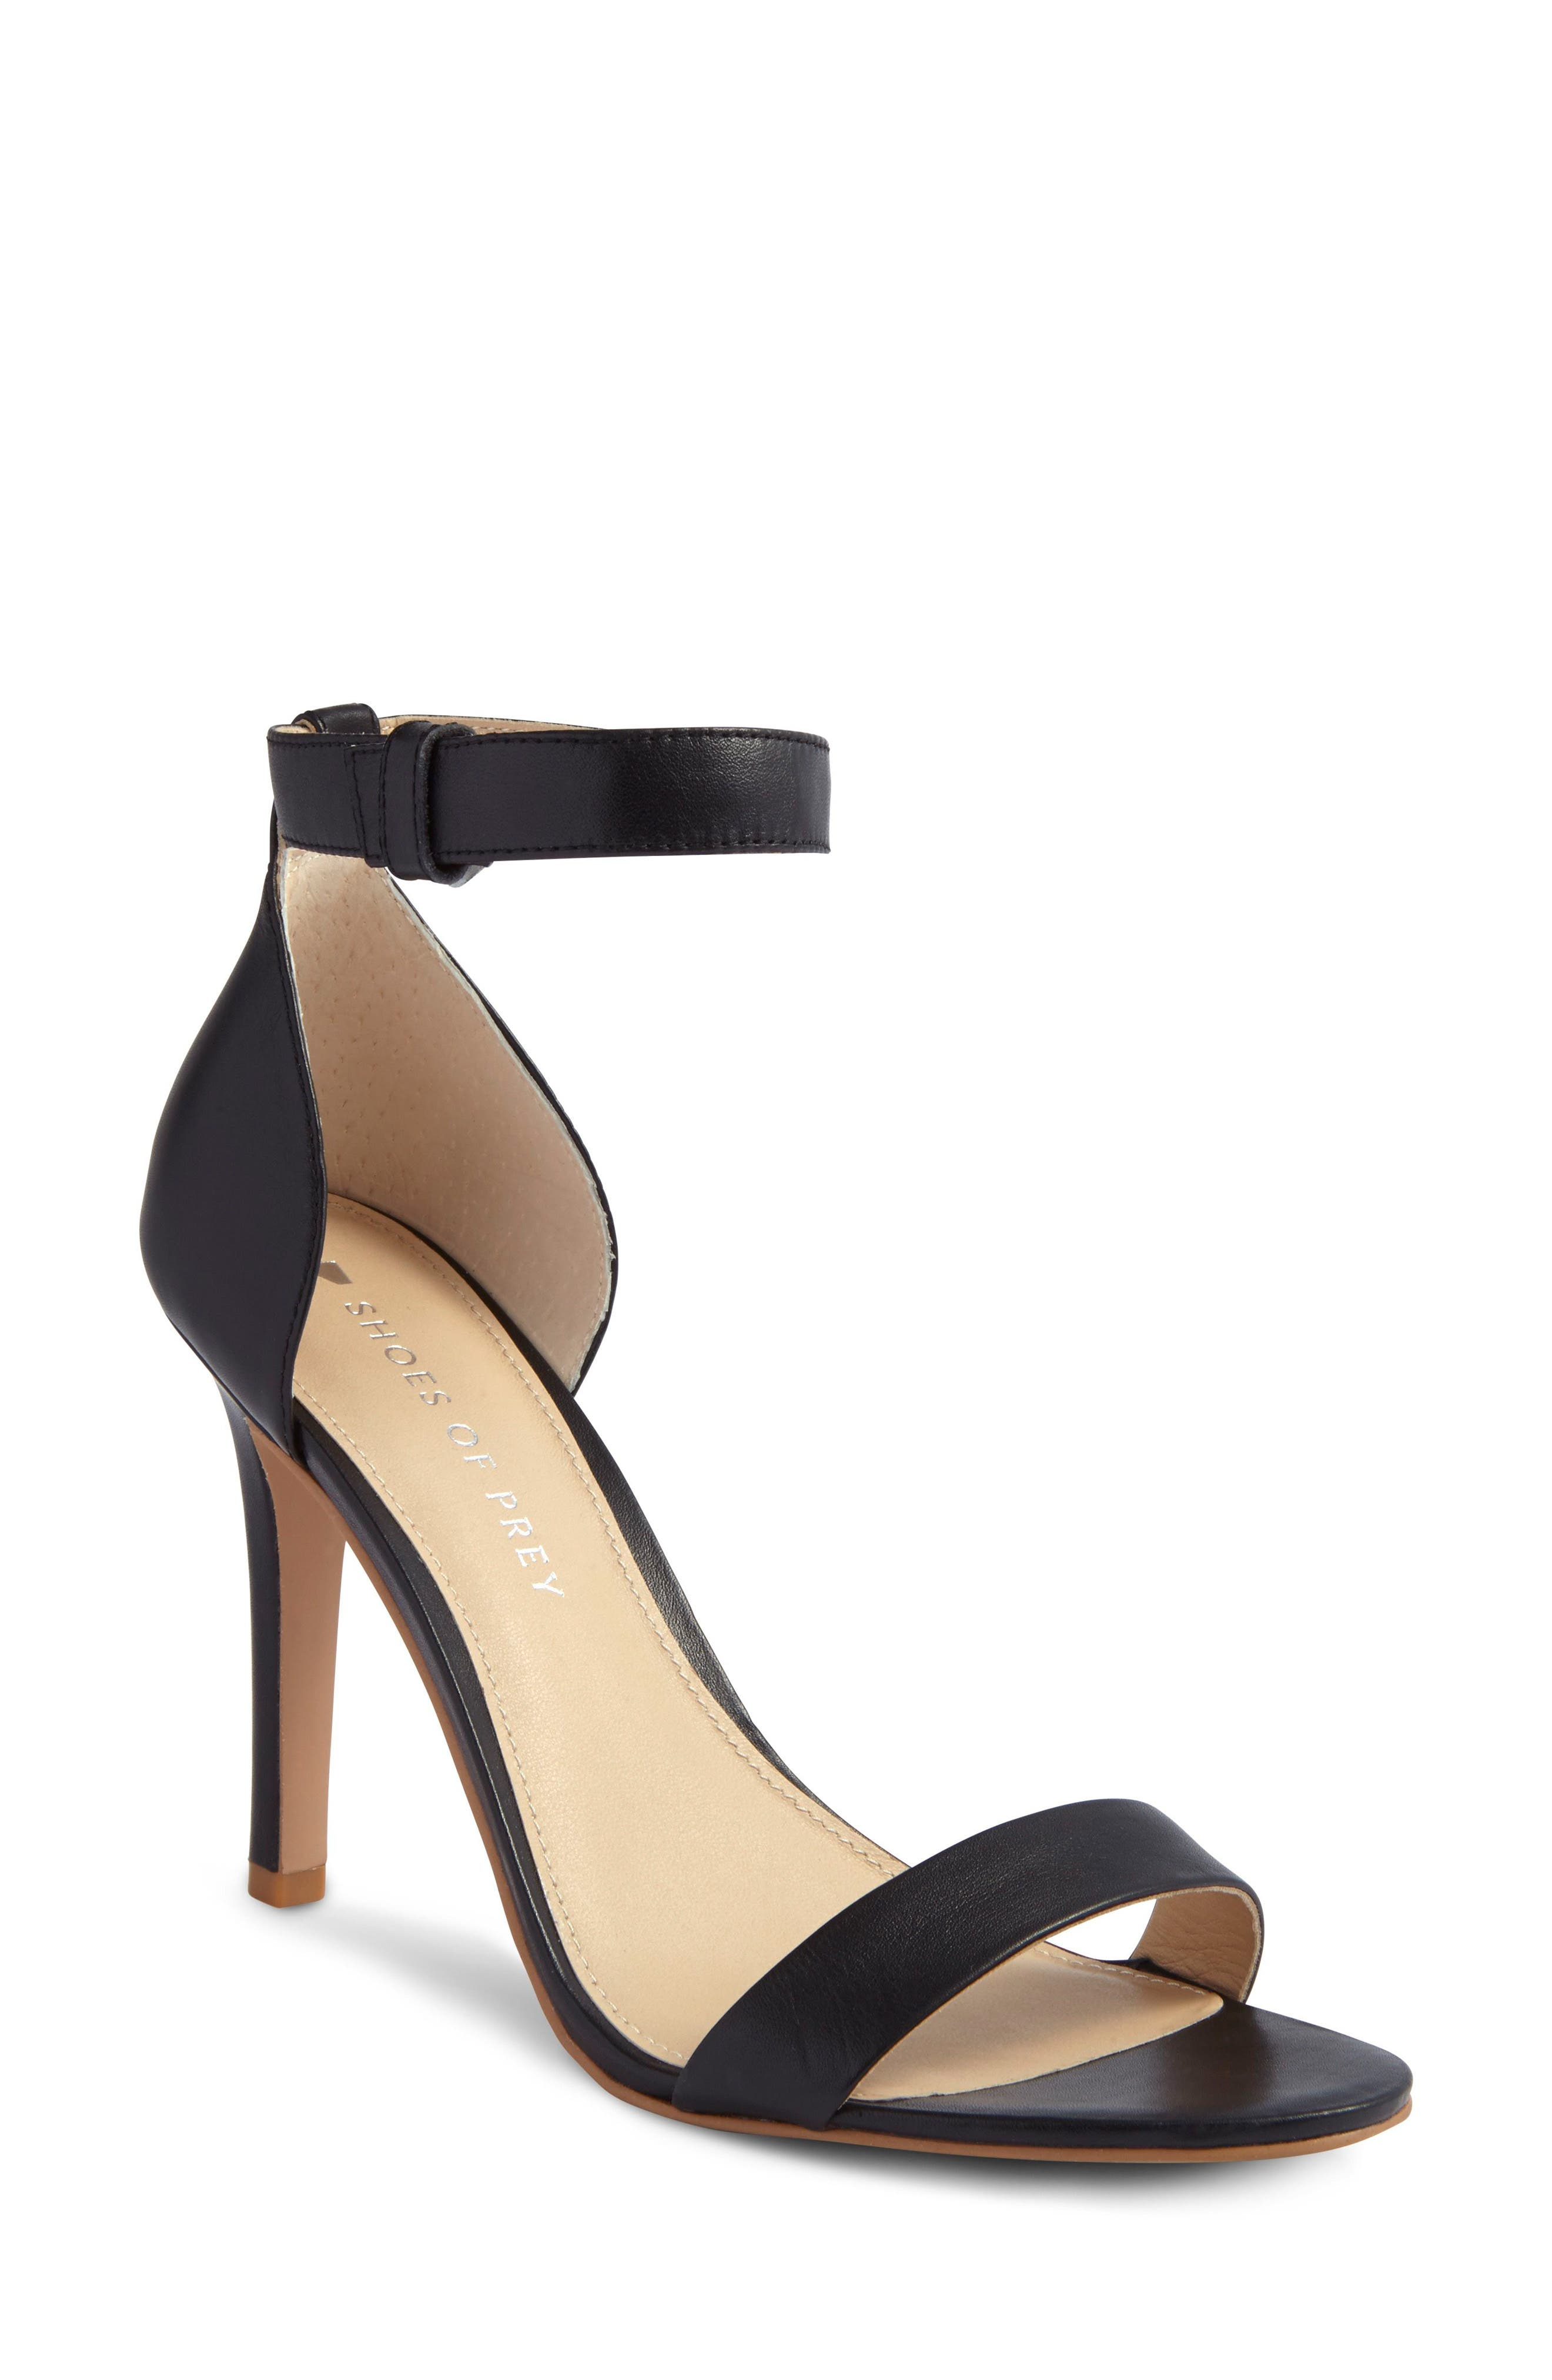 Ankle Strap Sandal,                             Main thumbnail 1, color,                             001